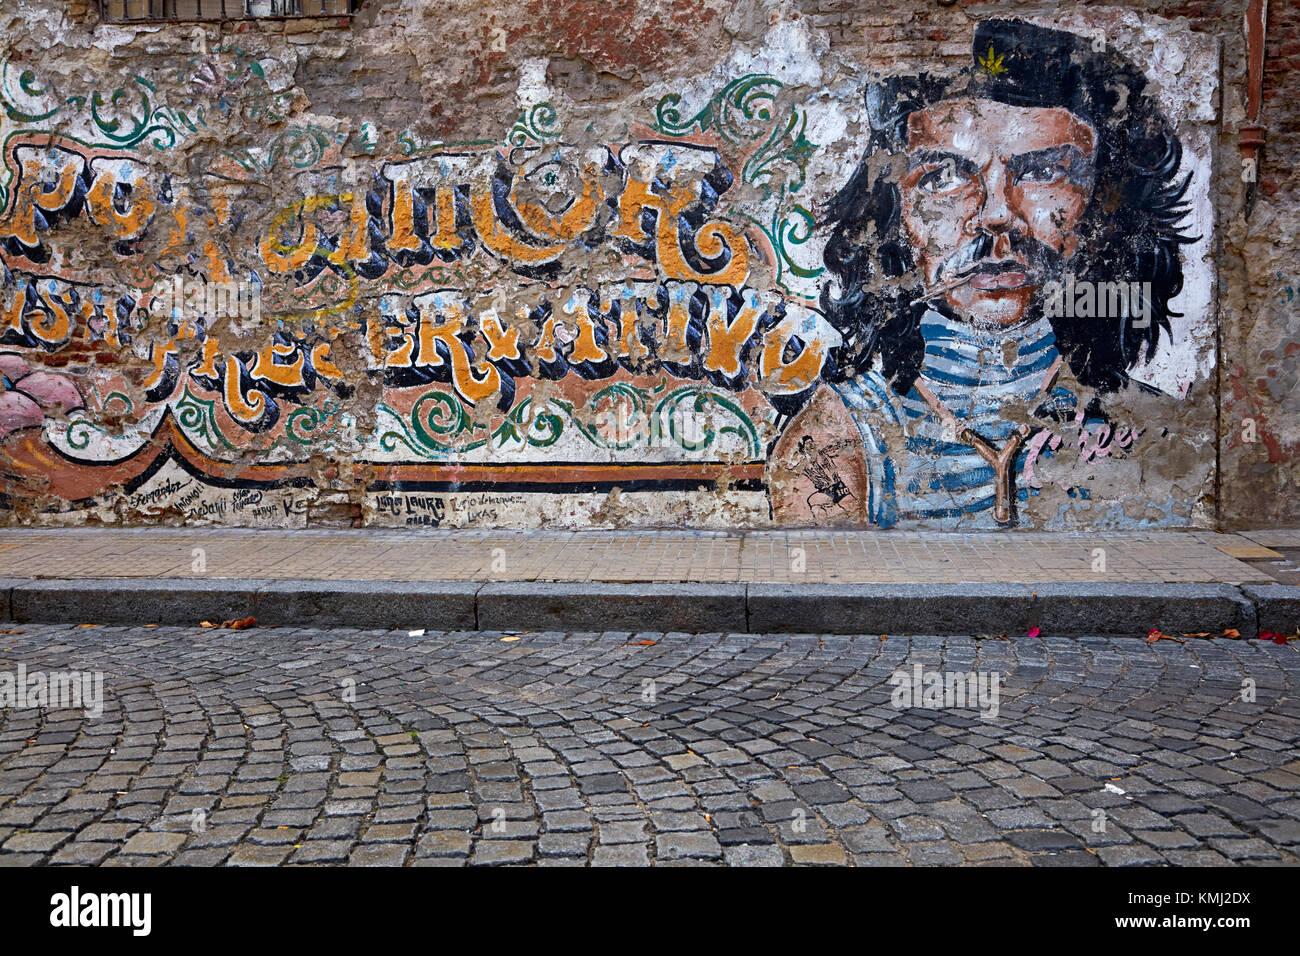 Che Guevara Wandbild, San Telmo, Buenos Aires, Argentinien, Südamerika Stockbild